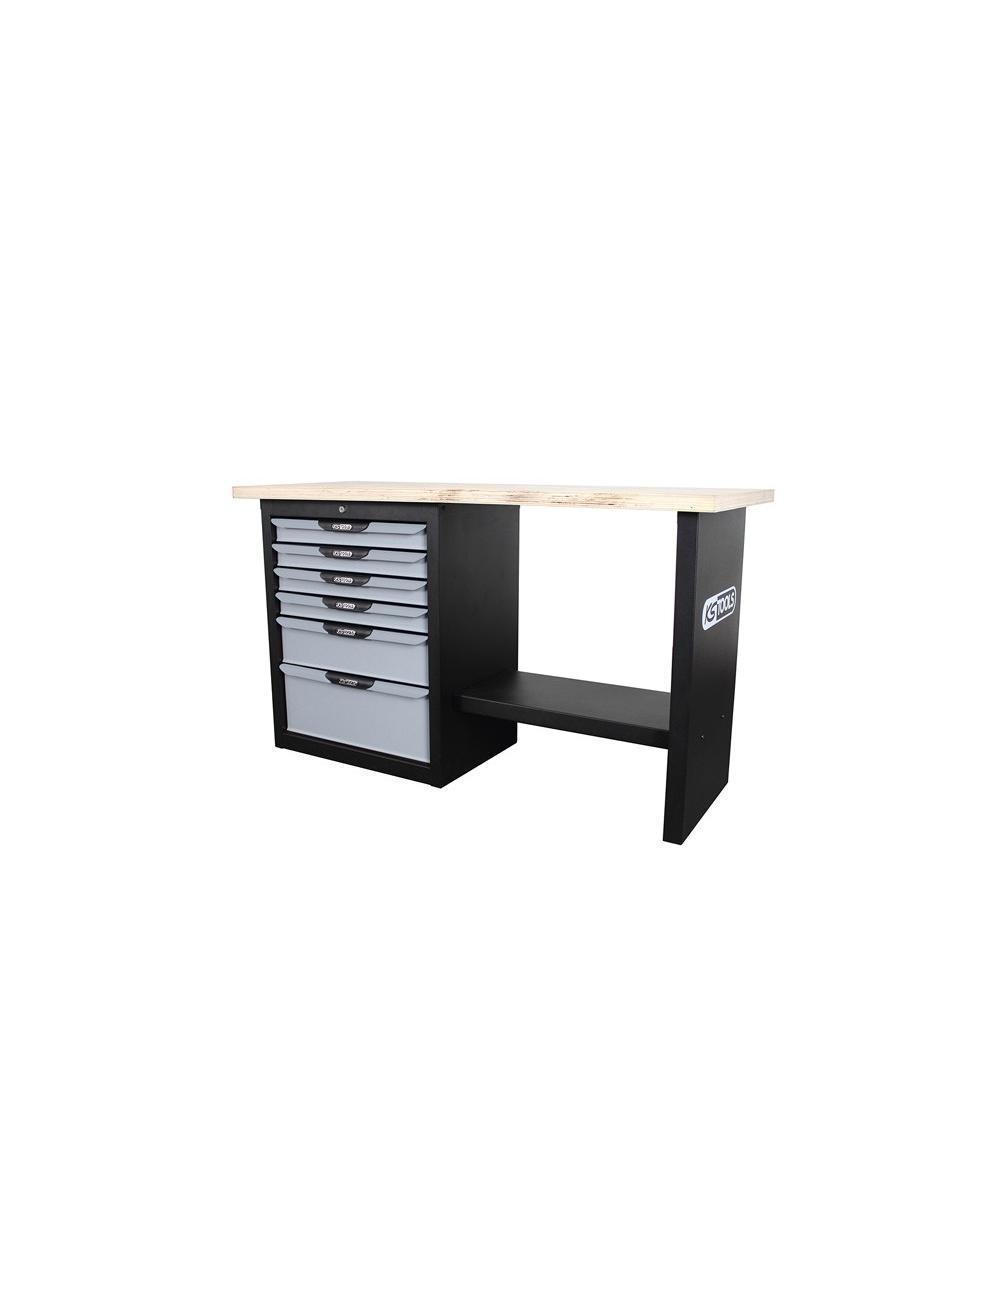 Etabli professionnel d'atelier 6 tiroirs